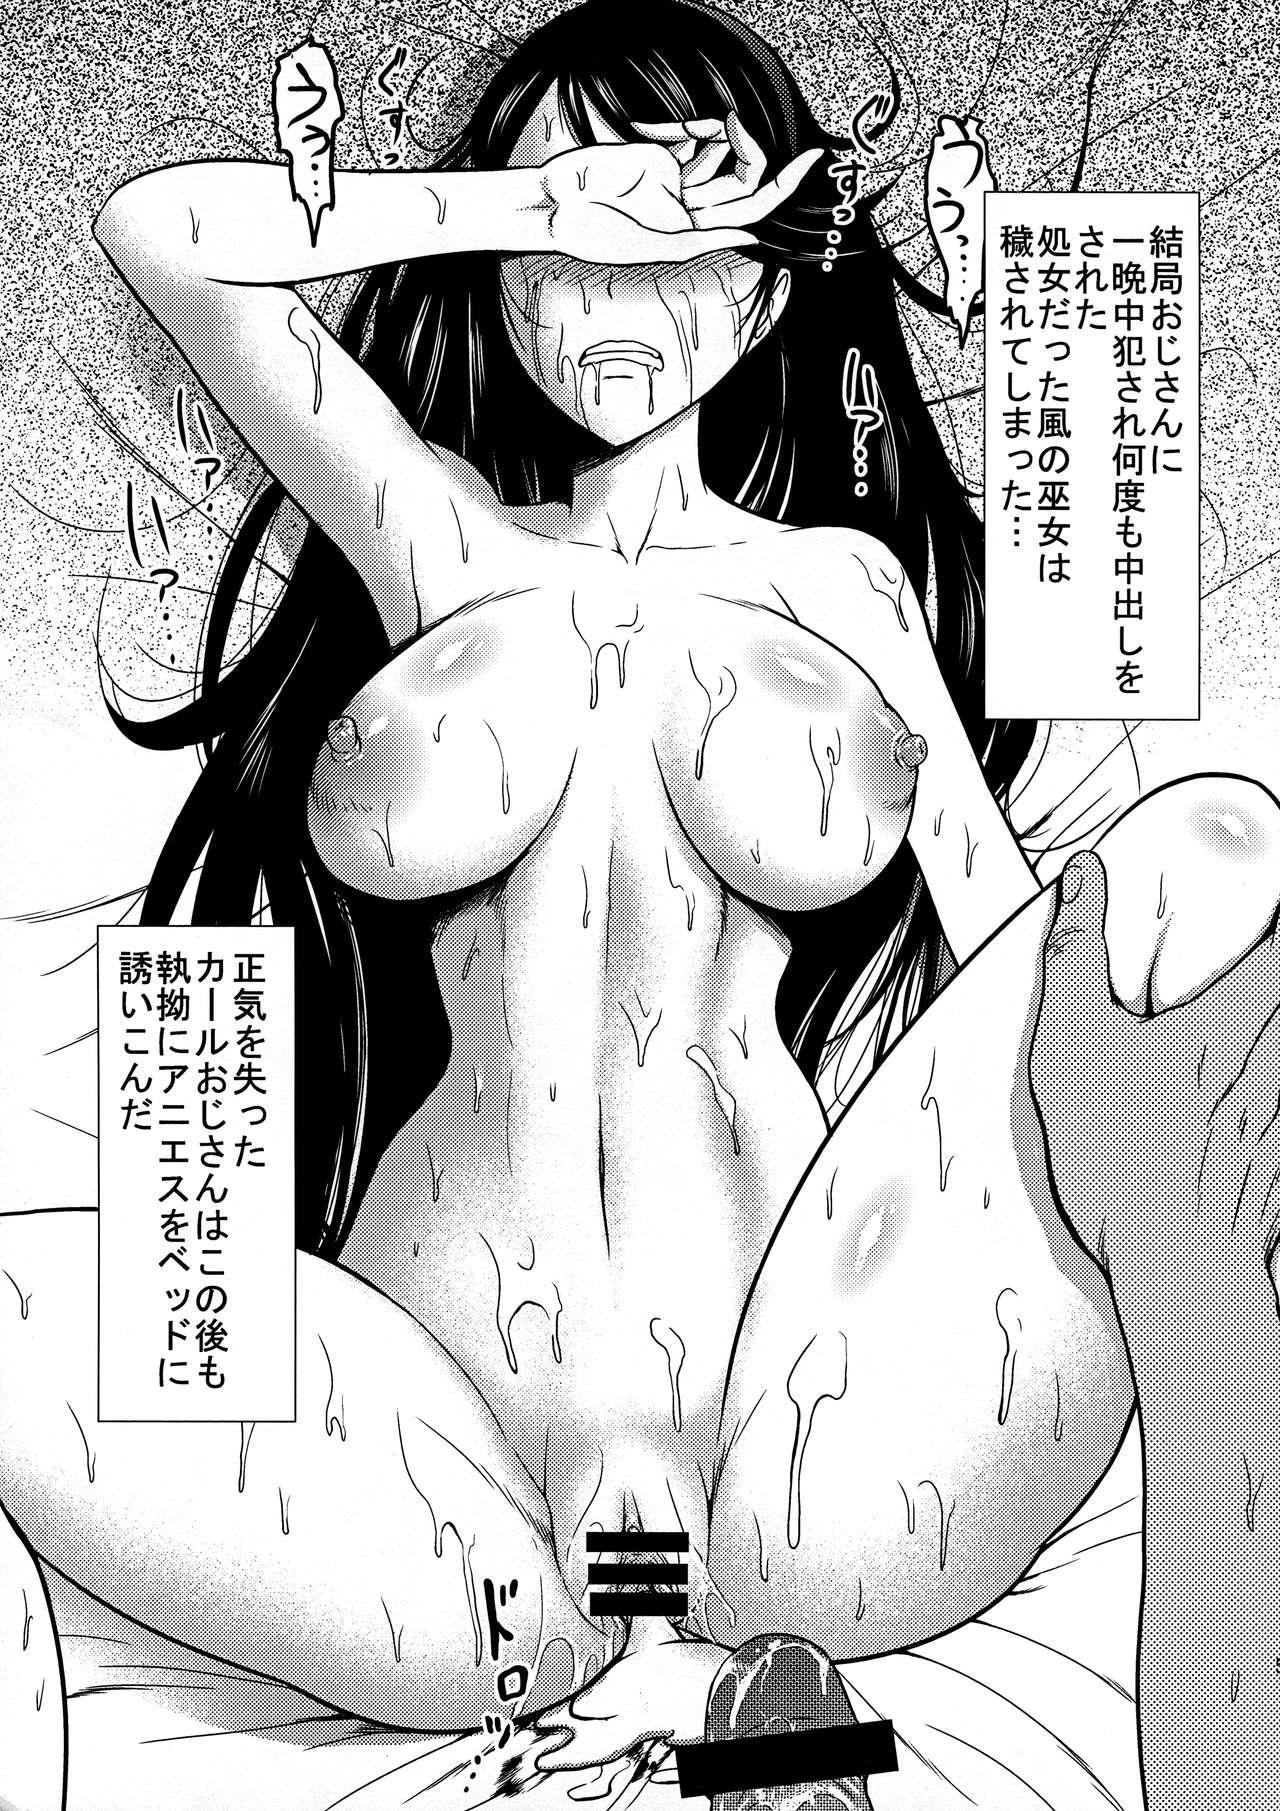 Kyohi Dekinai Heikou Sekai 3